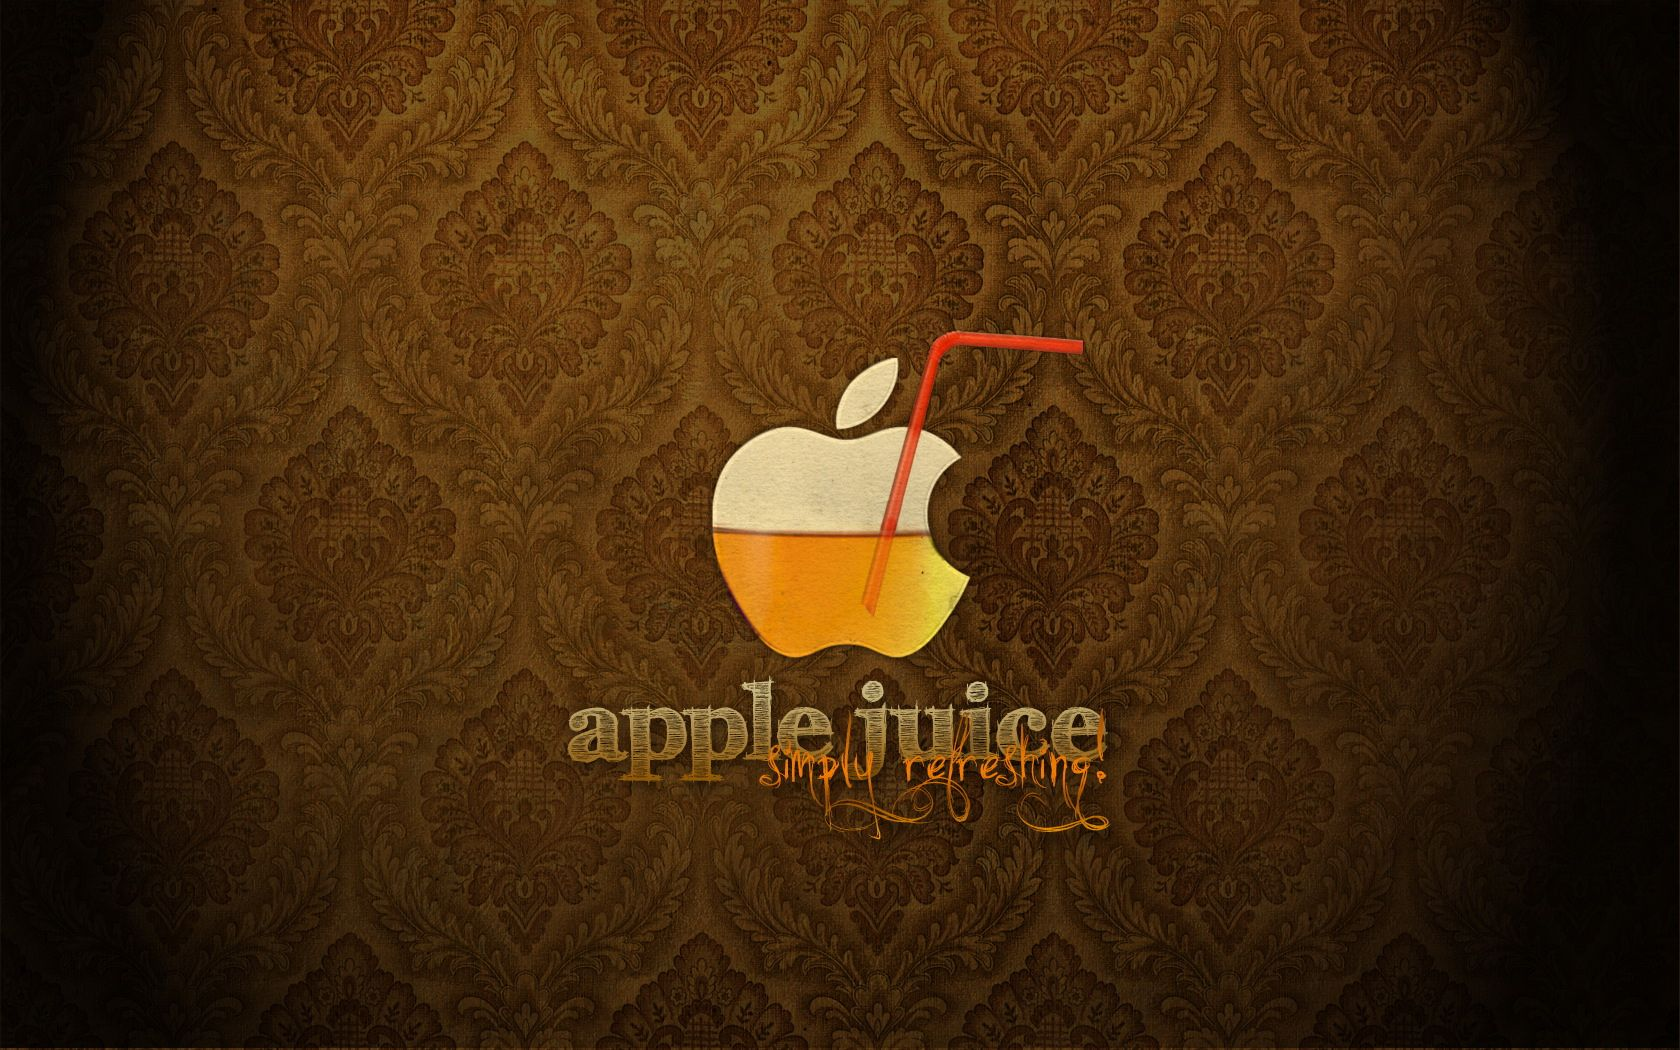 Funny Wallpaper Widescreen Hd Mac Wallpaper Apple Background Wallpapers Funny